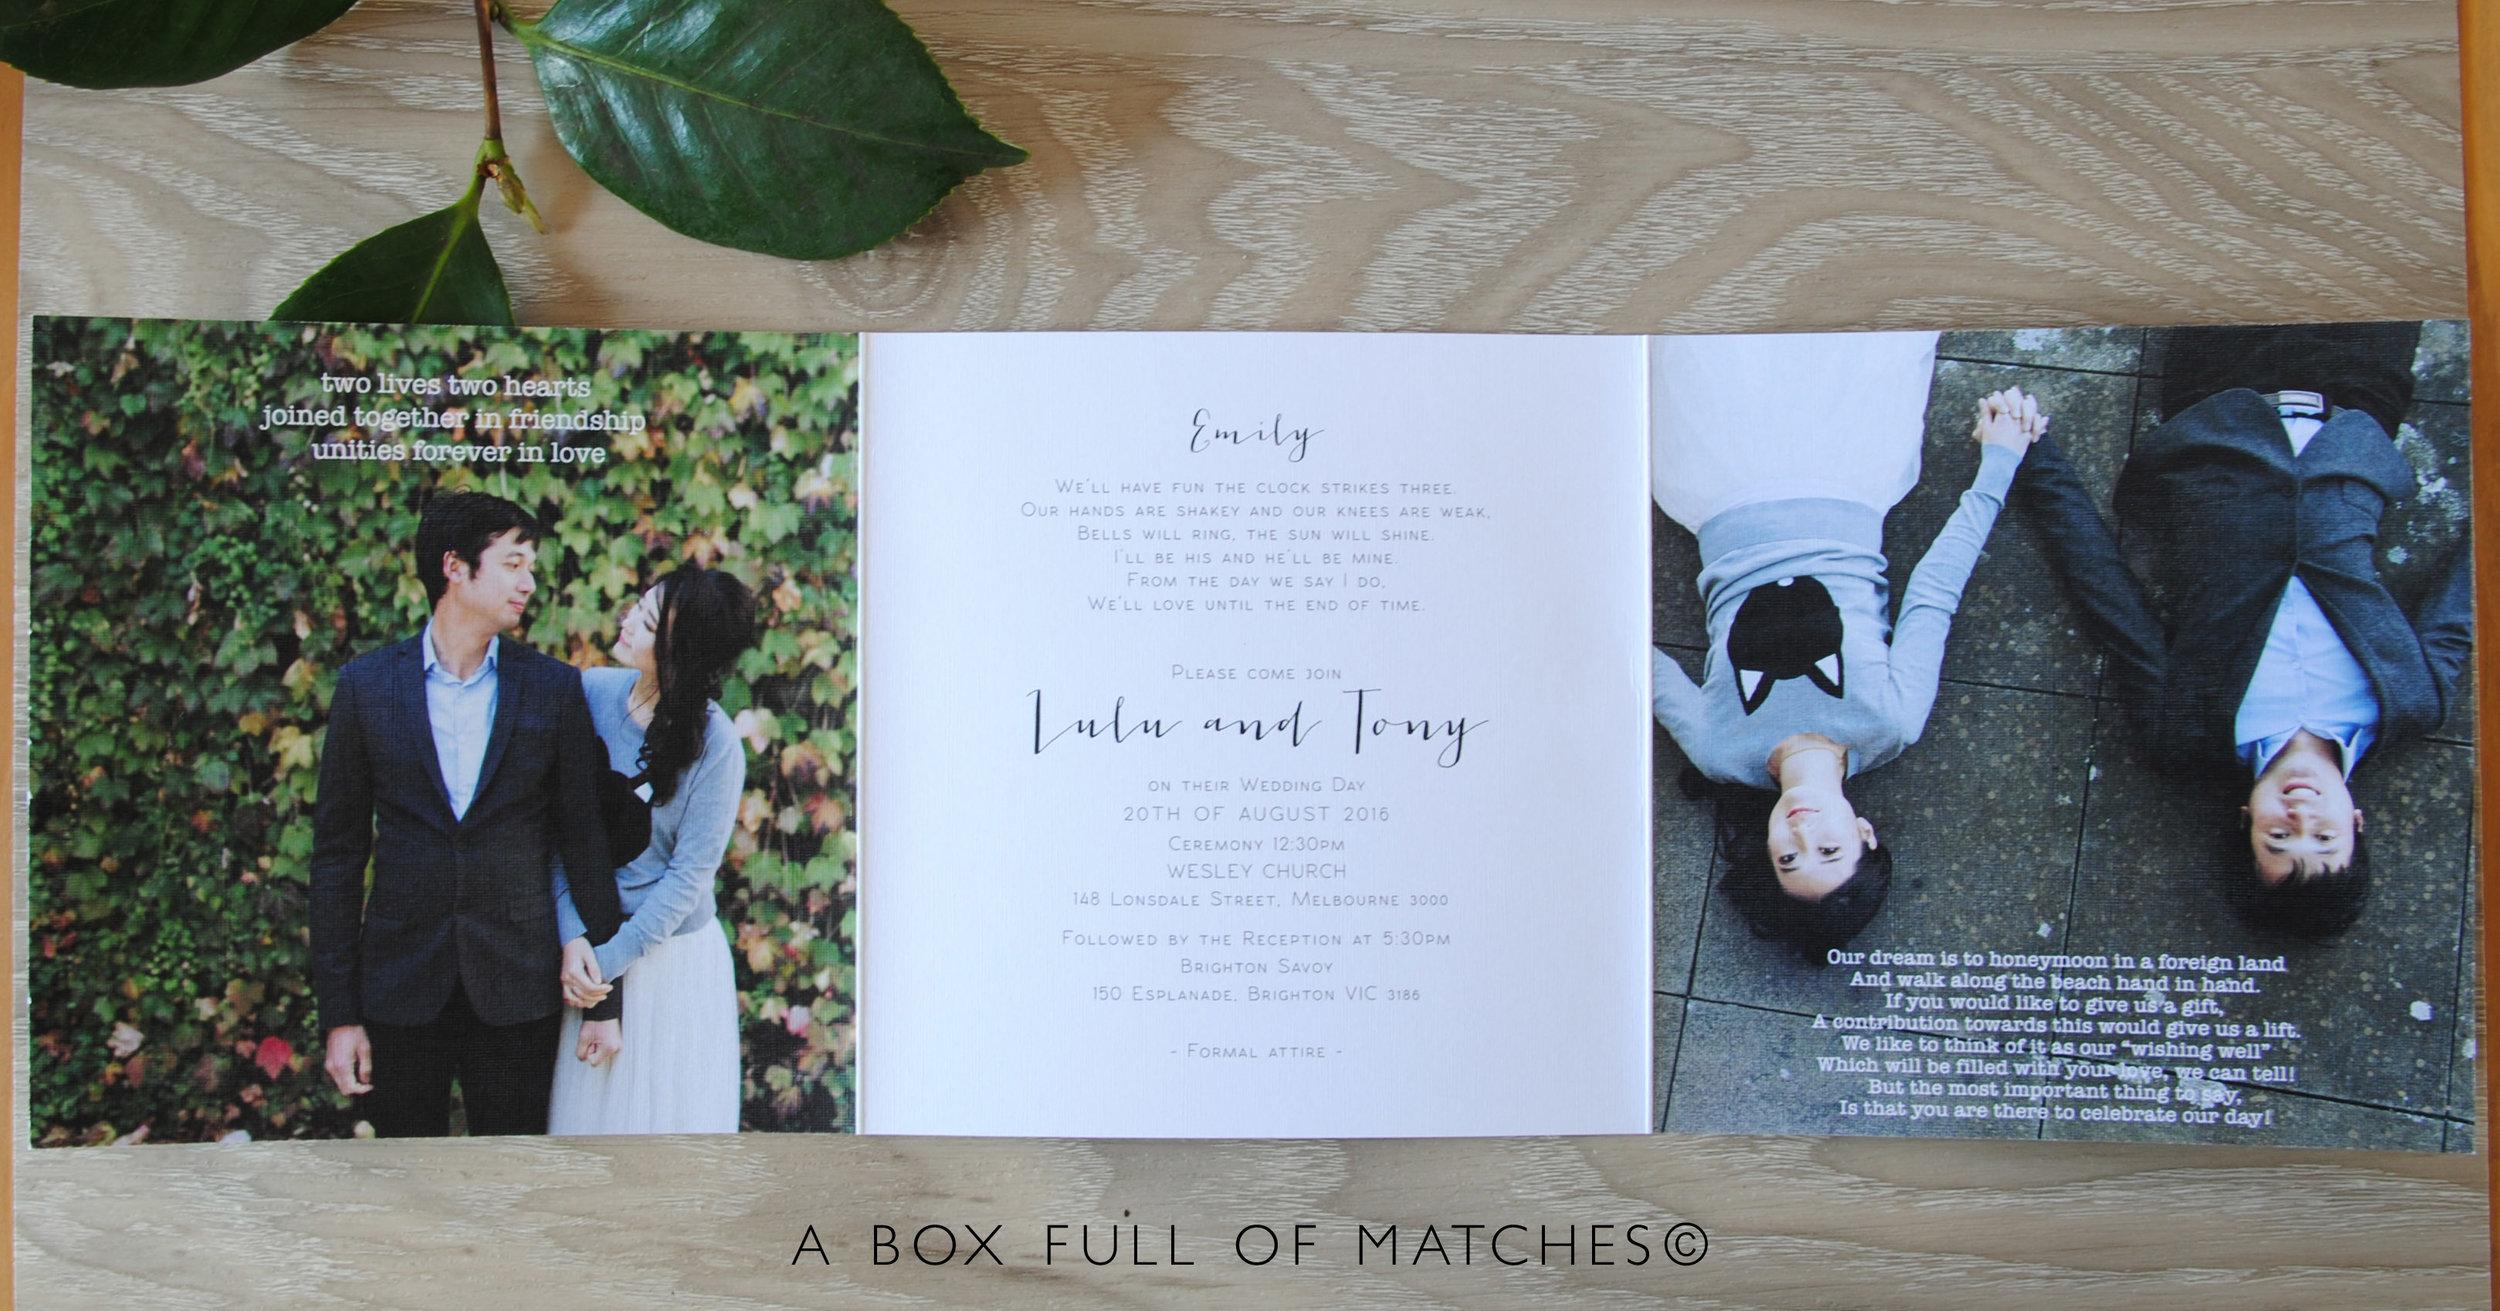 WEDDING-INVITATION-PHOTO-13.jpg